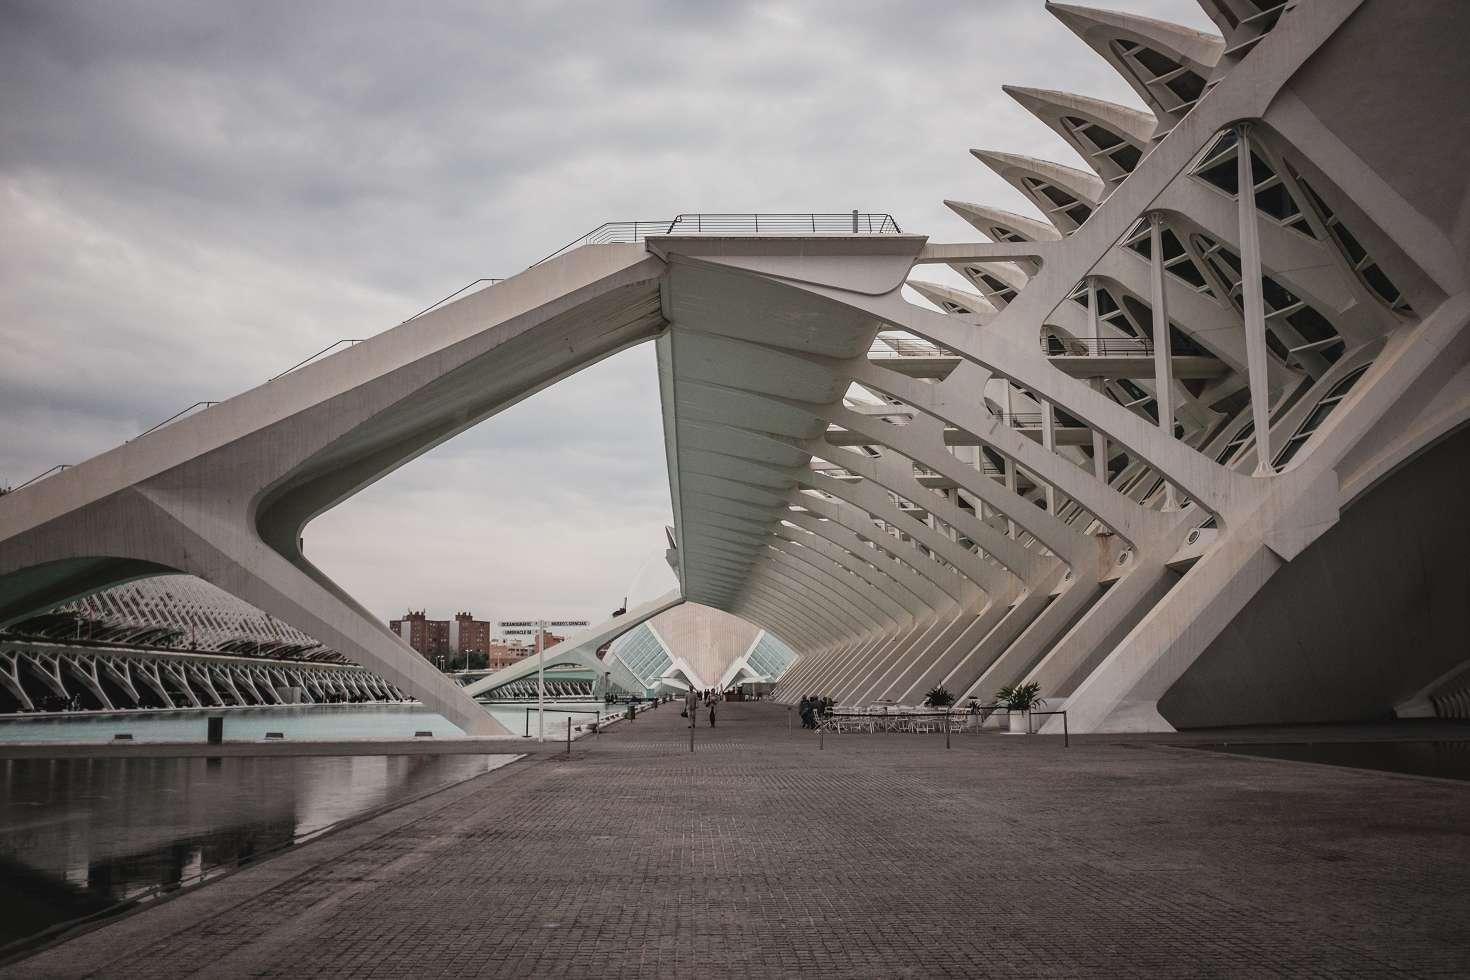 Valencia-Lissabon-Vigo-Stonehenge (2)